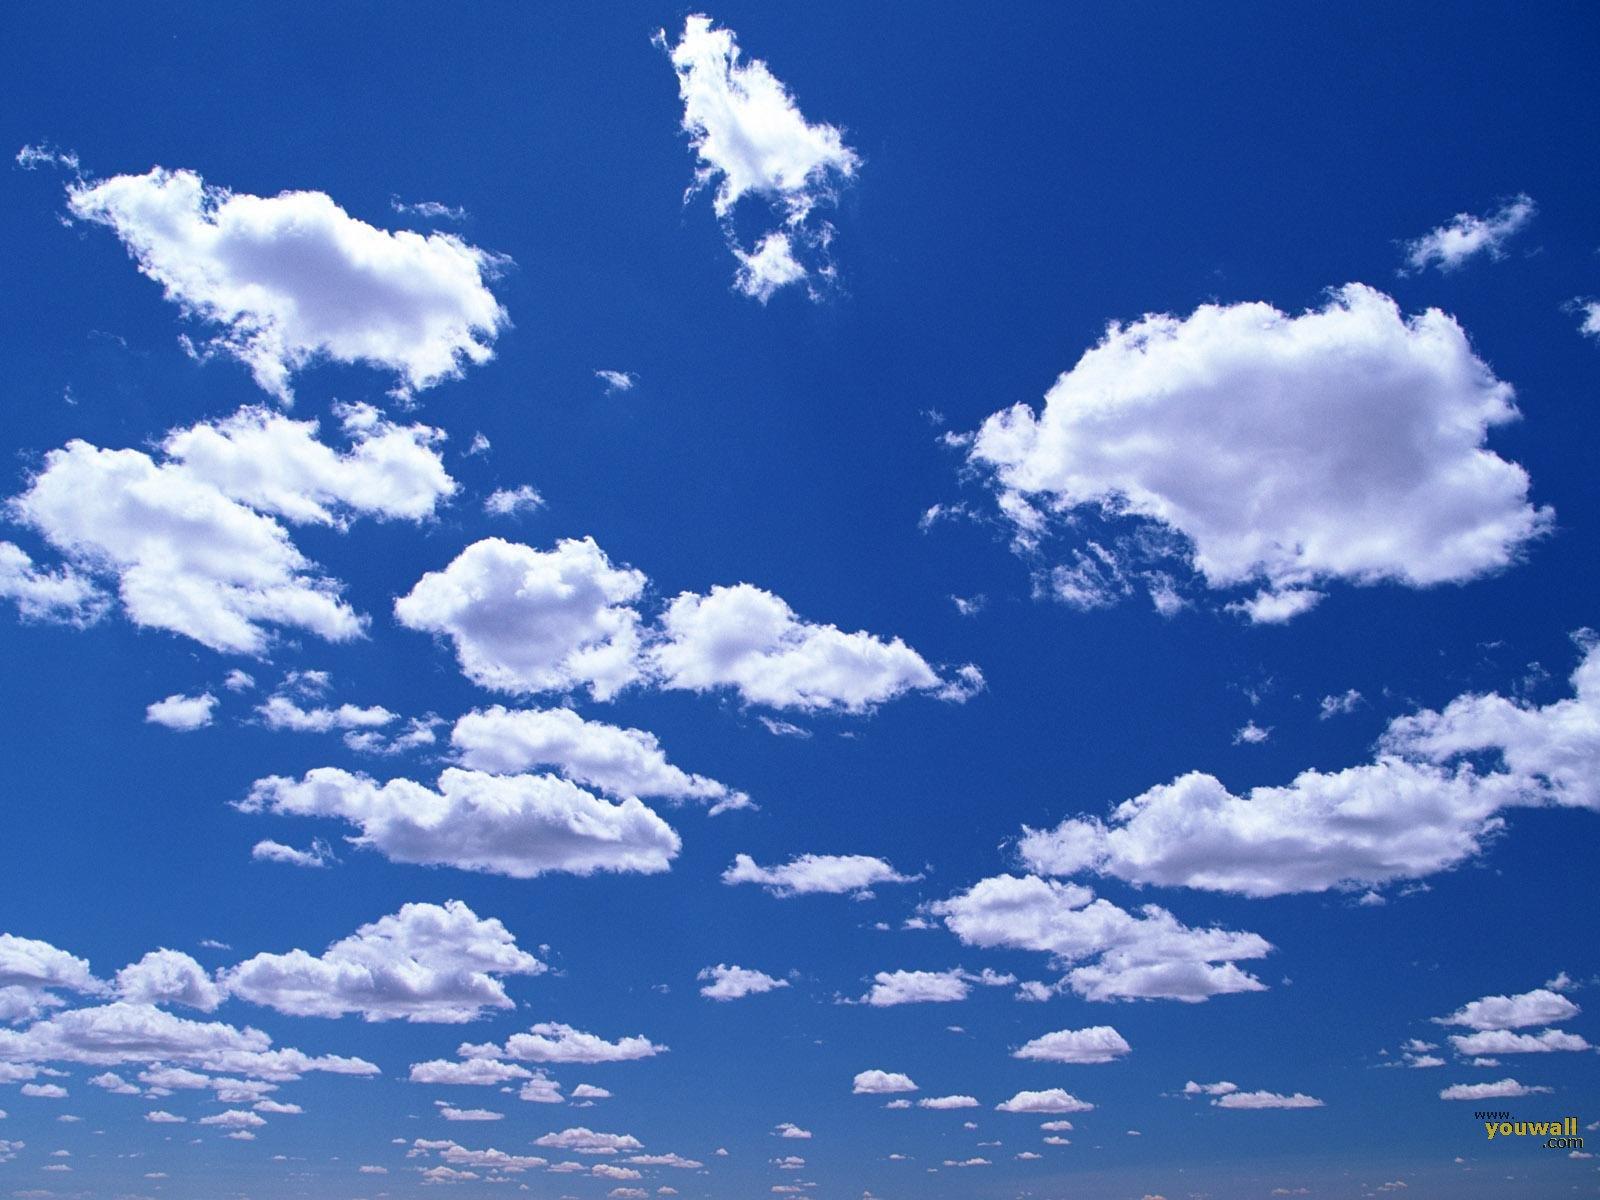 YouWall   Cloud Sky Wallpaper   wallpaperwallpapersfree wallpaper 1600x1200